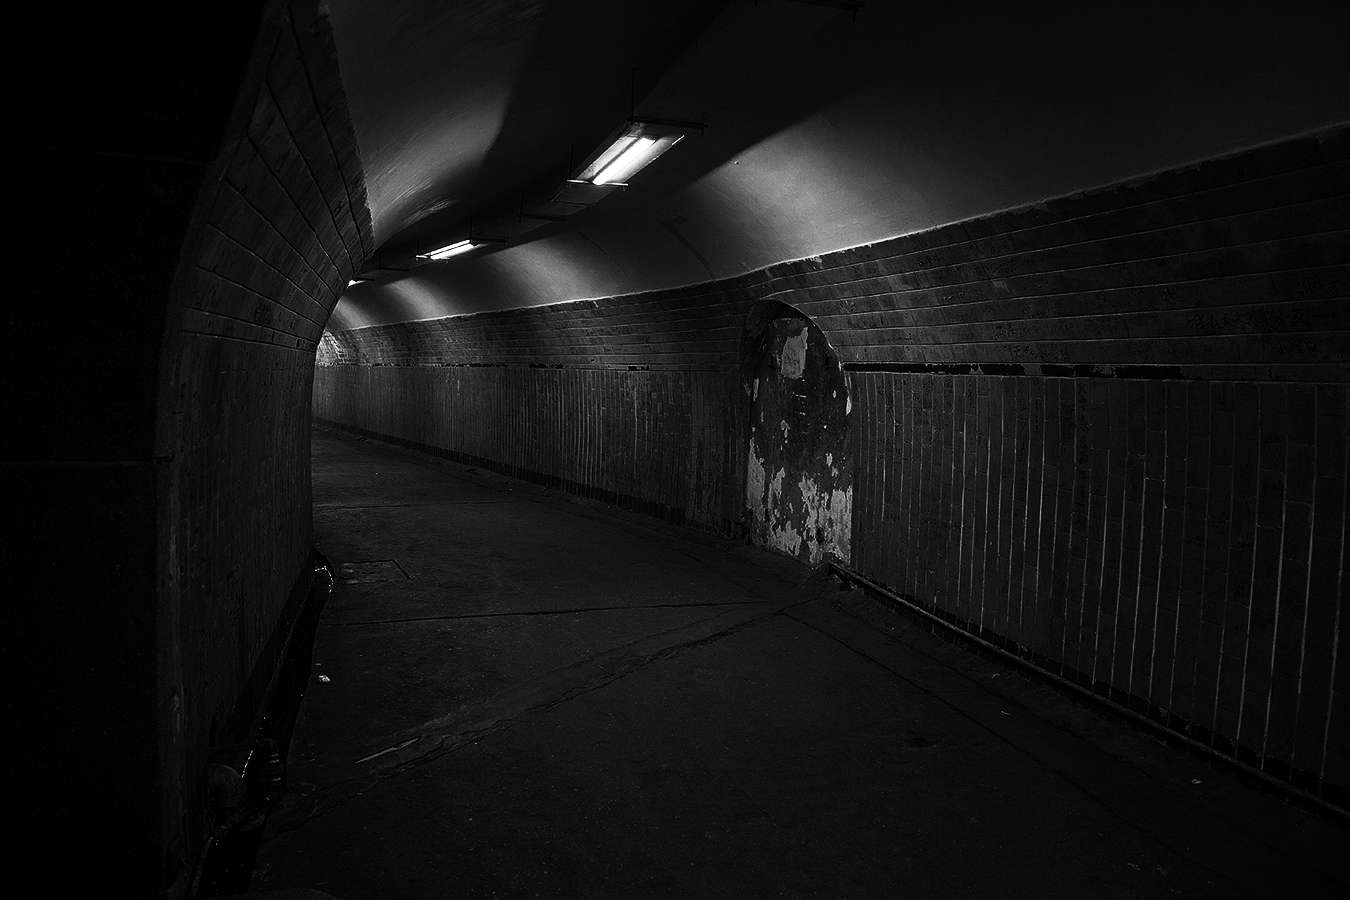 Linda_Ruan_canal_light_shadow_black_and_white